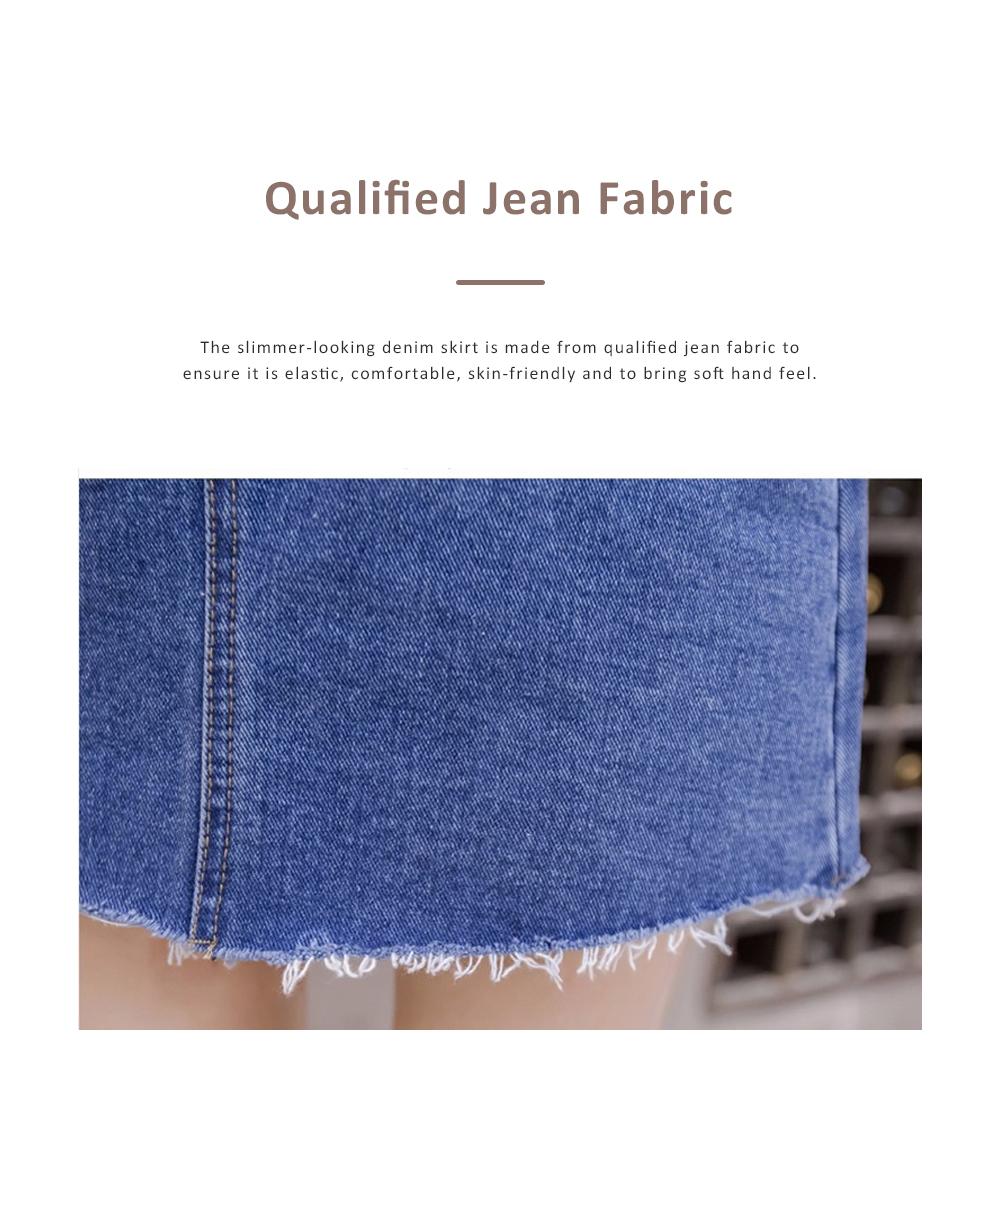 Close-fitting Irregular Denim Skirt for Women in Summer High-waisted Slimmer-looking Sheath Dress Hairy Brim Jean Midskirt Women Dress 1